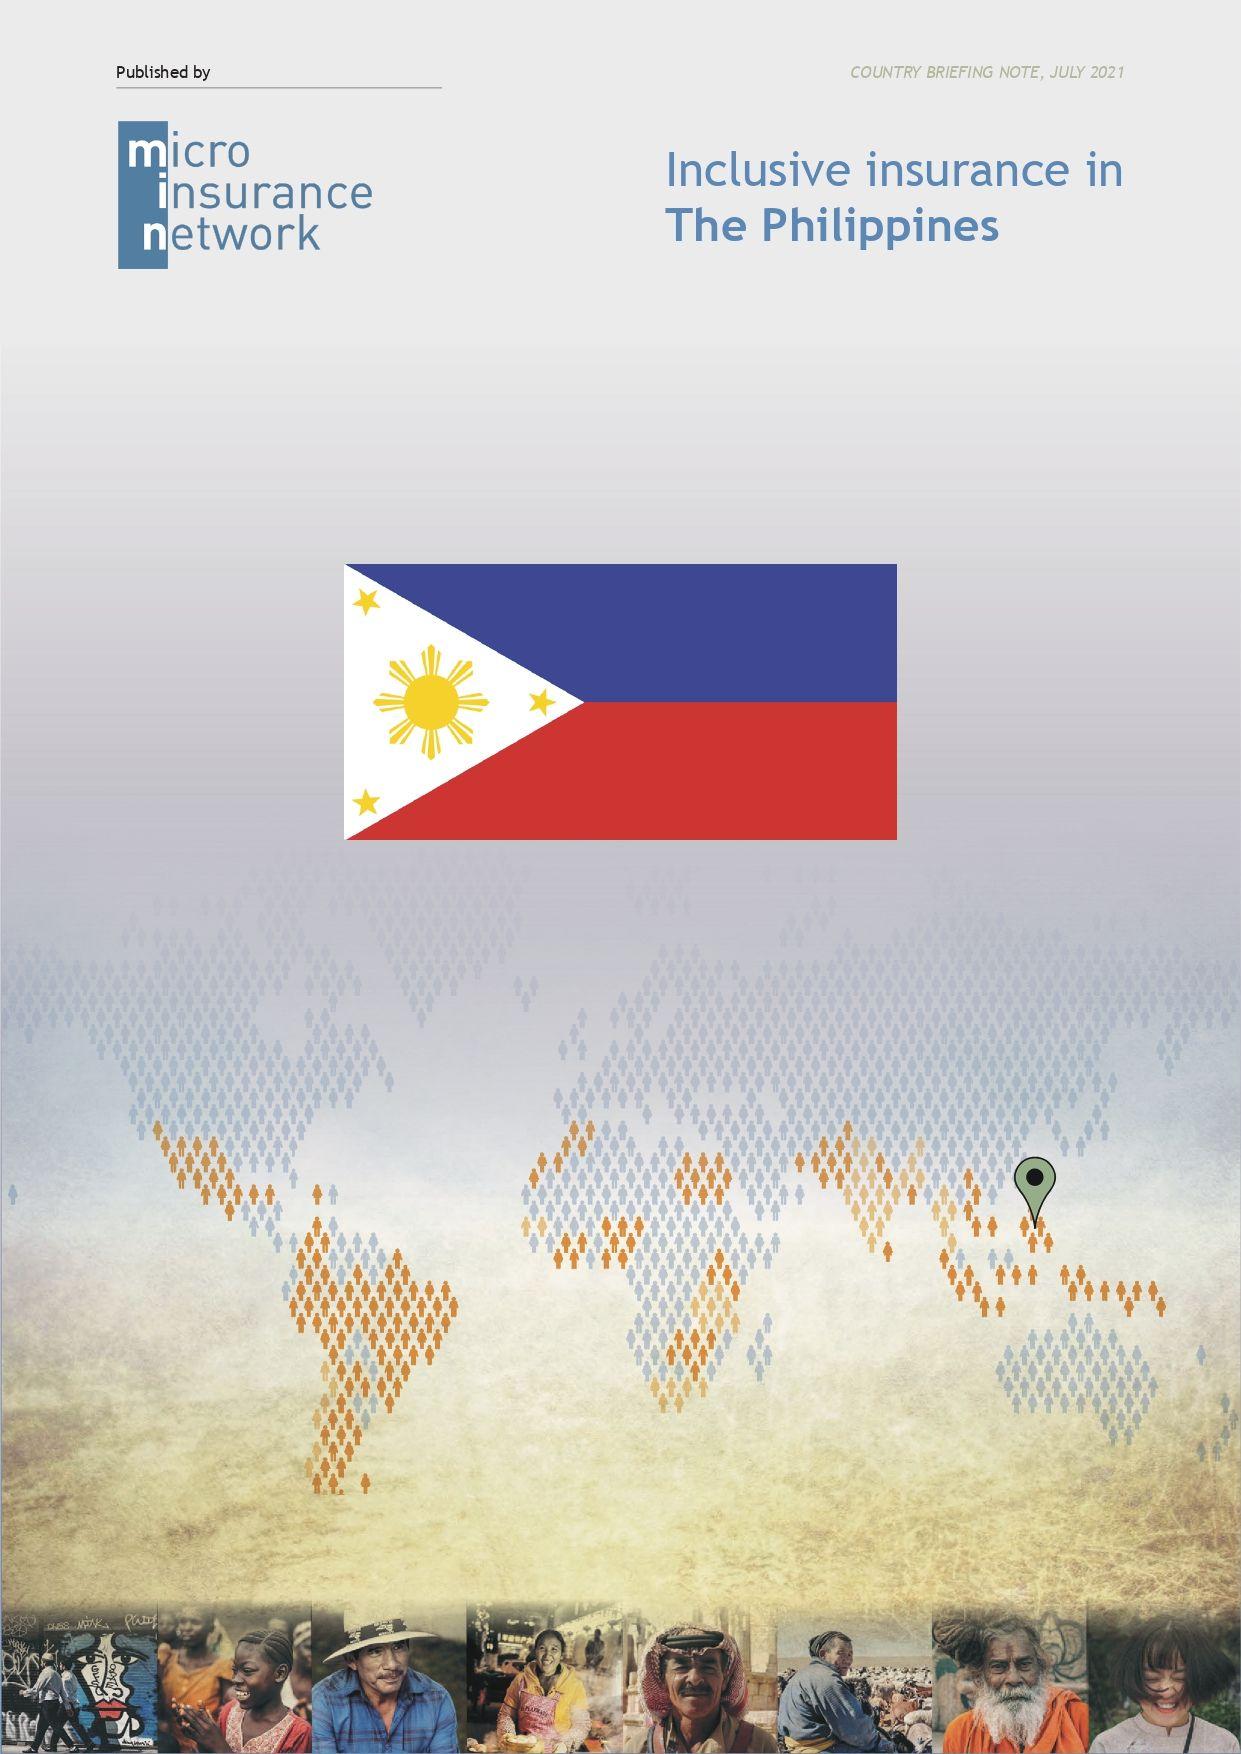 PHILIPPINES COUNTRY BRIEF EN VF-1_page-0001.jpg